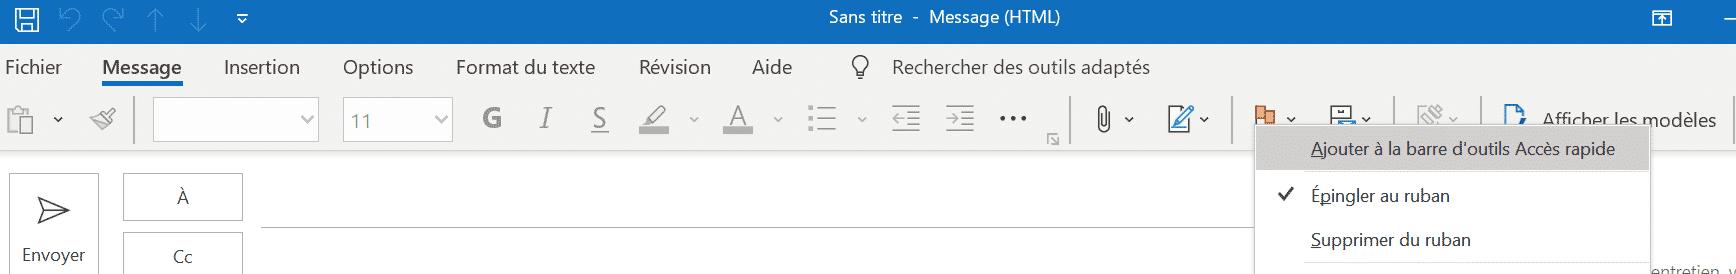 Barre d'outils accès rapide Outlook Office